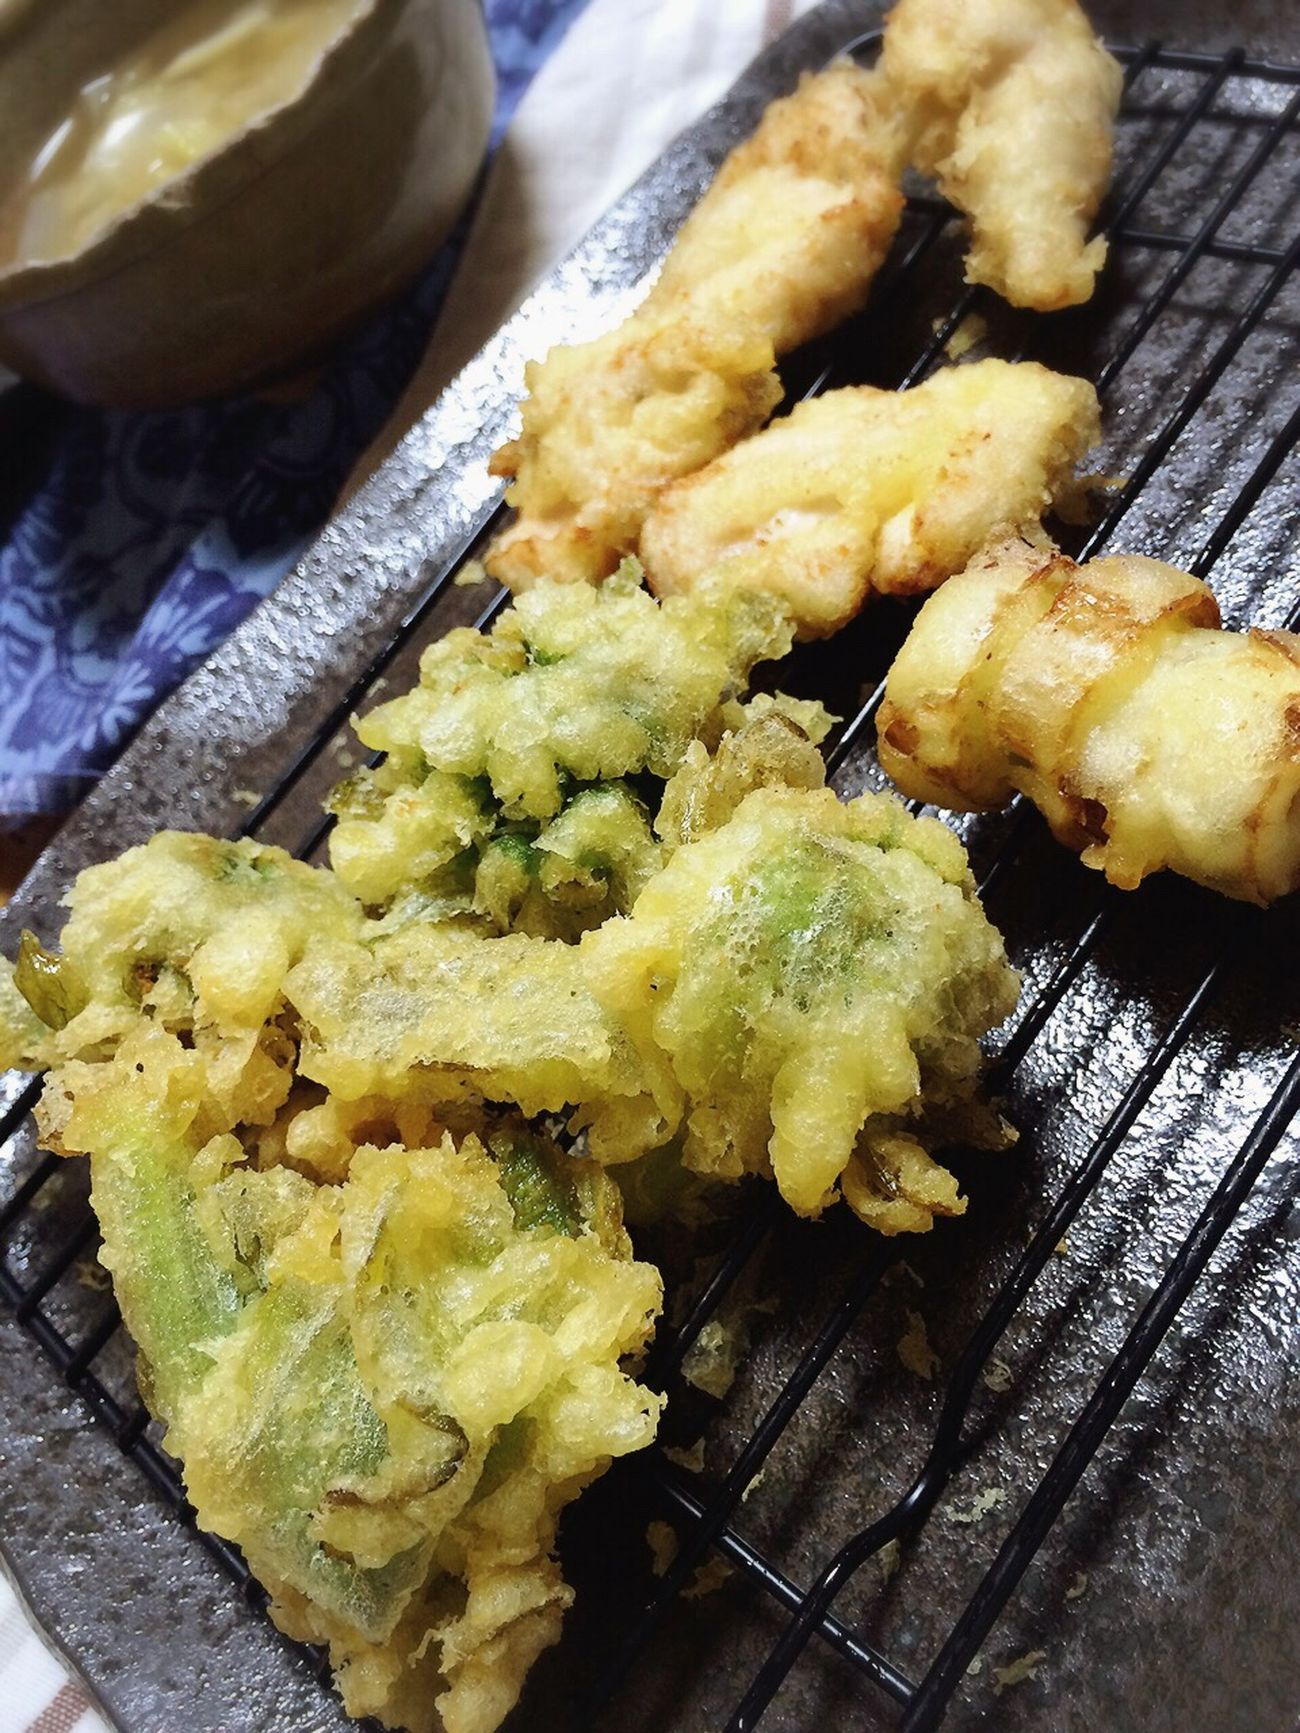 Japanese Food Japan Tenpura Giant Butterbur ふきのとう 天ぷら Dinner Fry Delicious Tasty Sogood